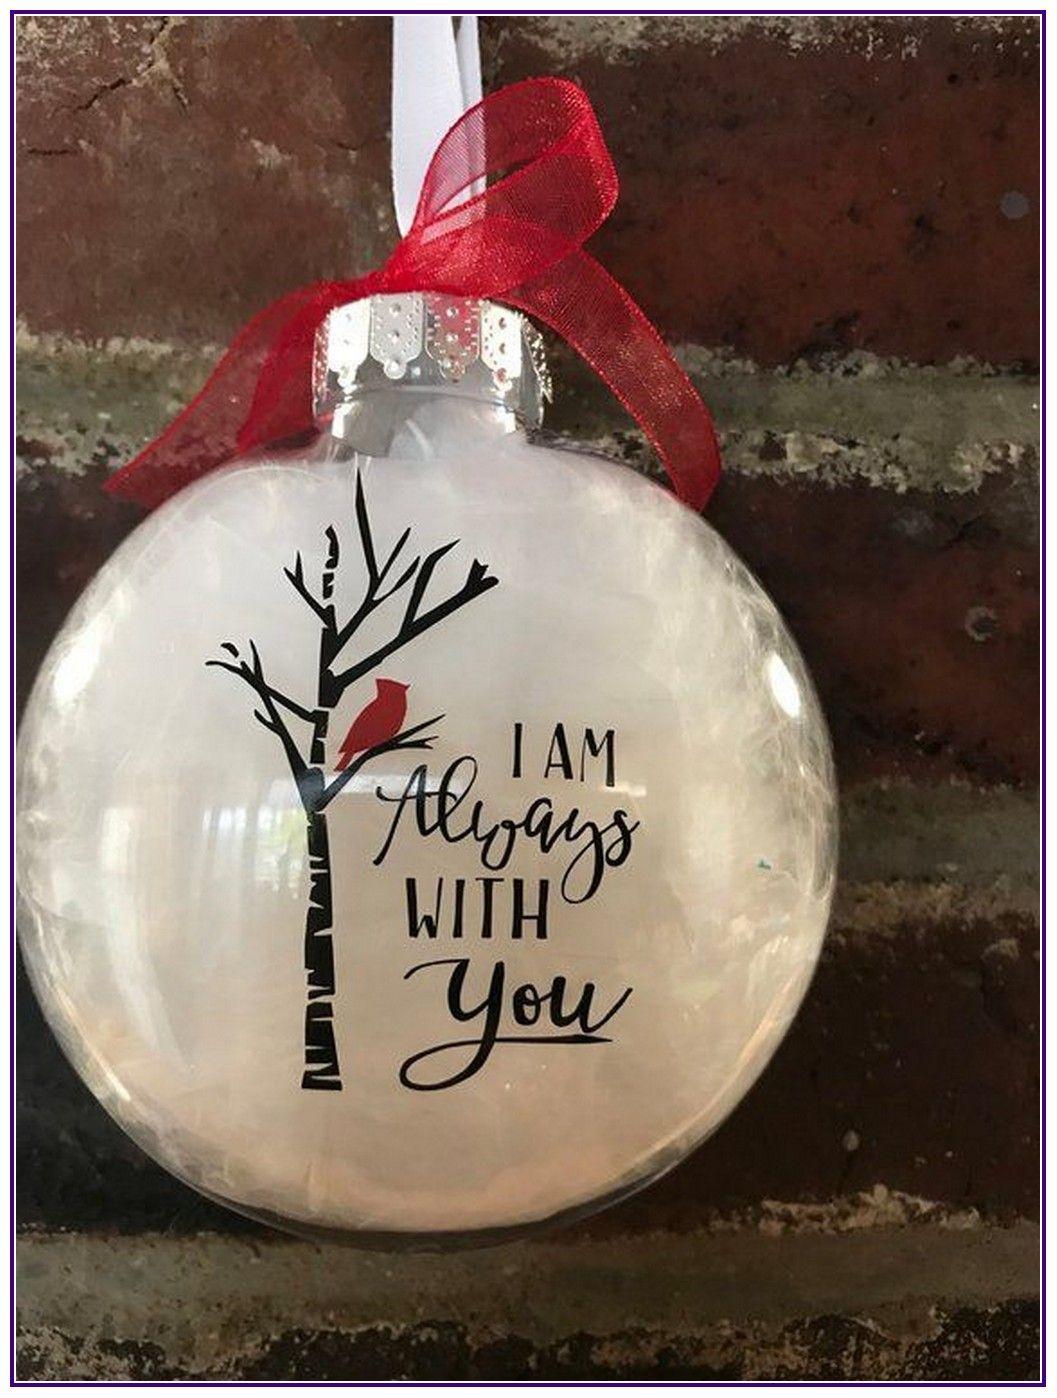 25 Easy Diy Christmas Ornaments For A Personalized Tree Decor 00015 Diy Christmas Ornaments Easy Clear Christmas Ornaments Christmas Ornaments Homemade